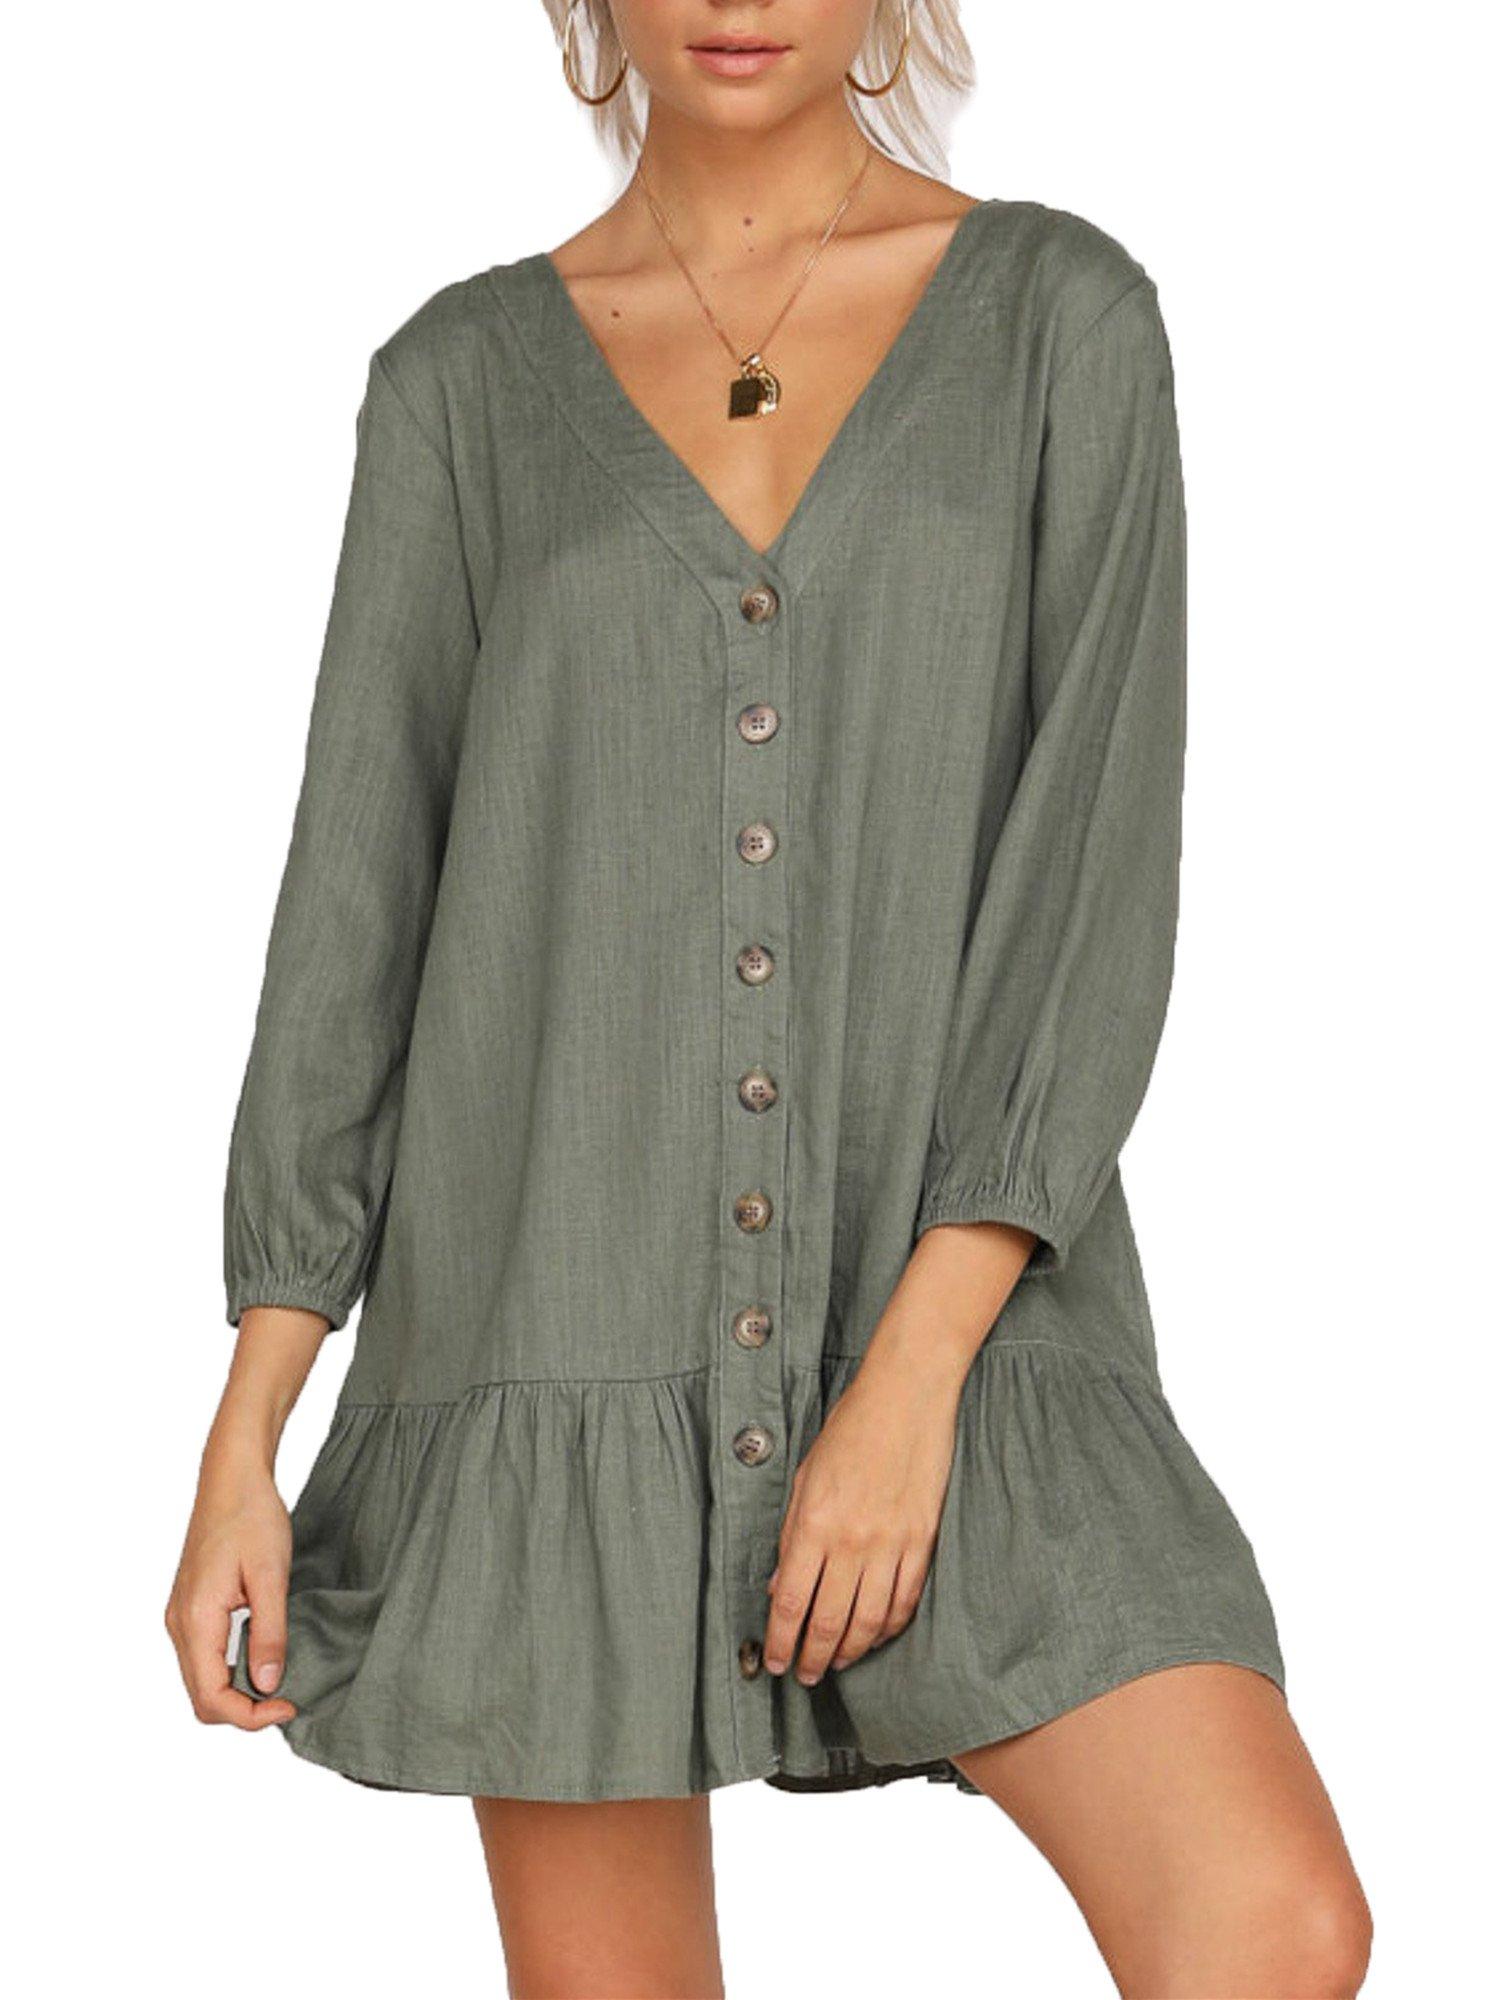 FOUR CLOUR Women's Casual Summer Deep V Neck Button Down Short Sleeve Mini Dress (X-Large, A-Green)